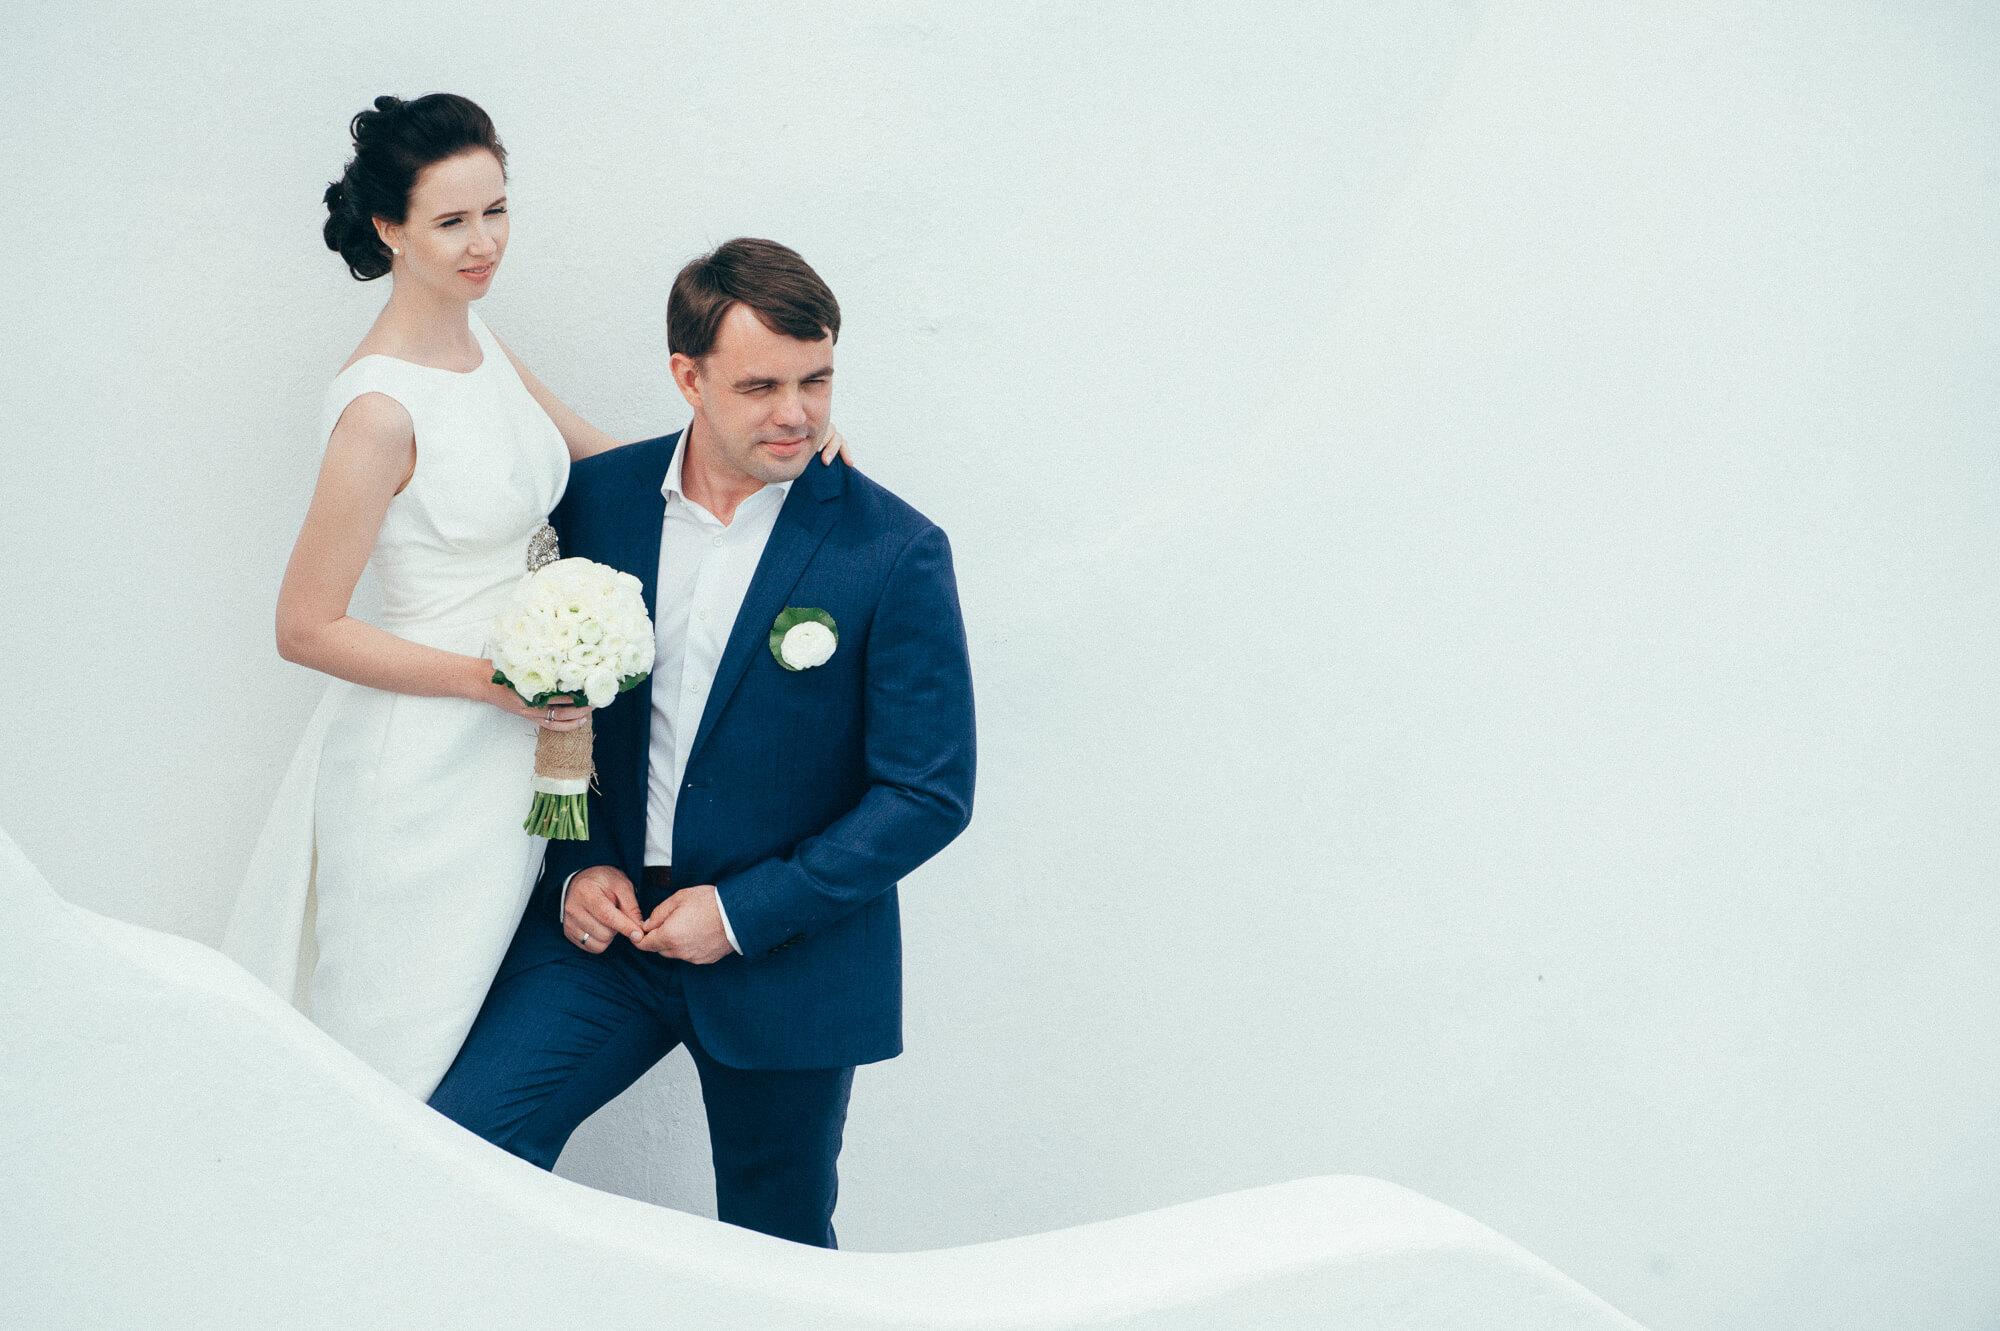 manes-wedding-photographer-greece-128